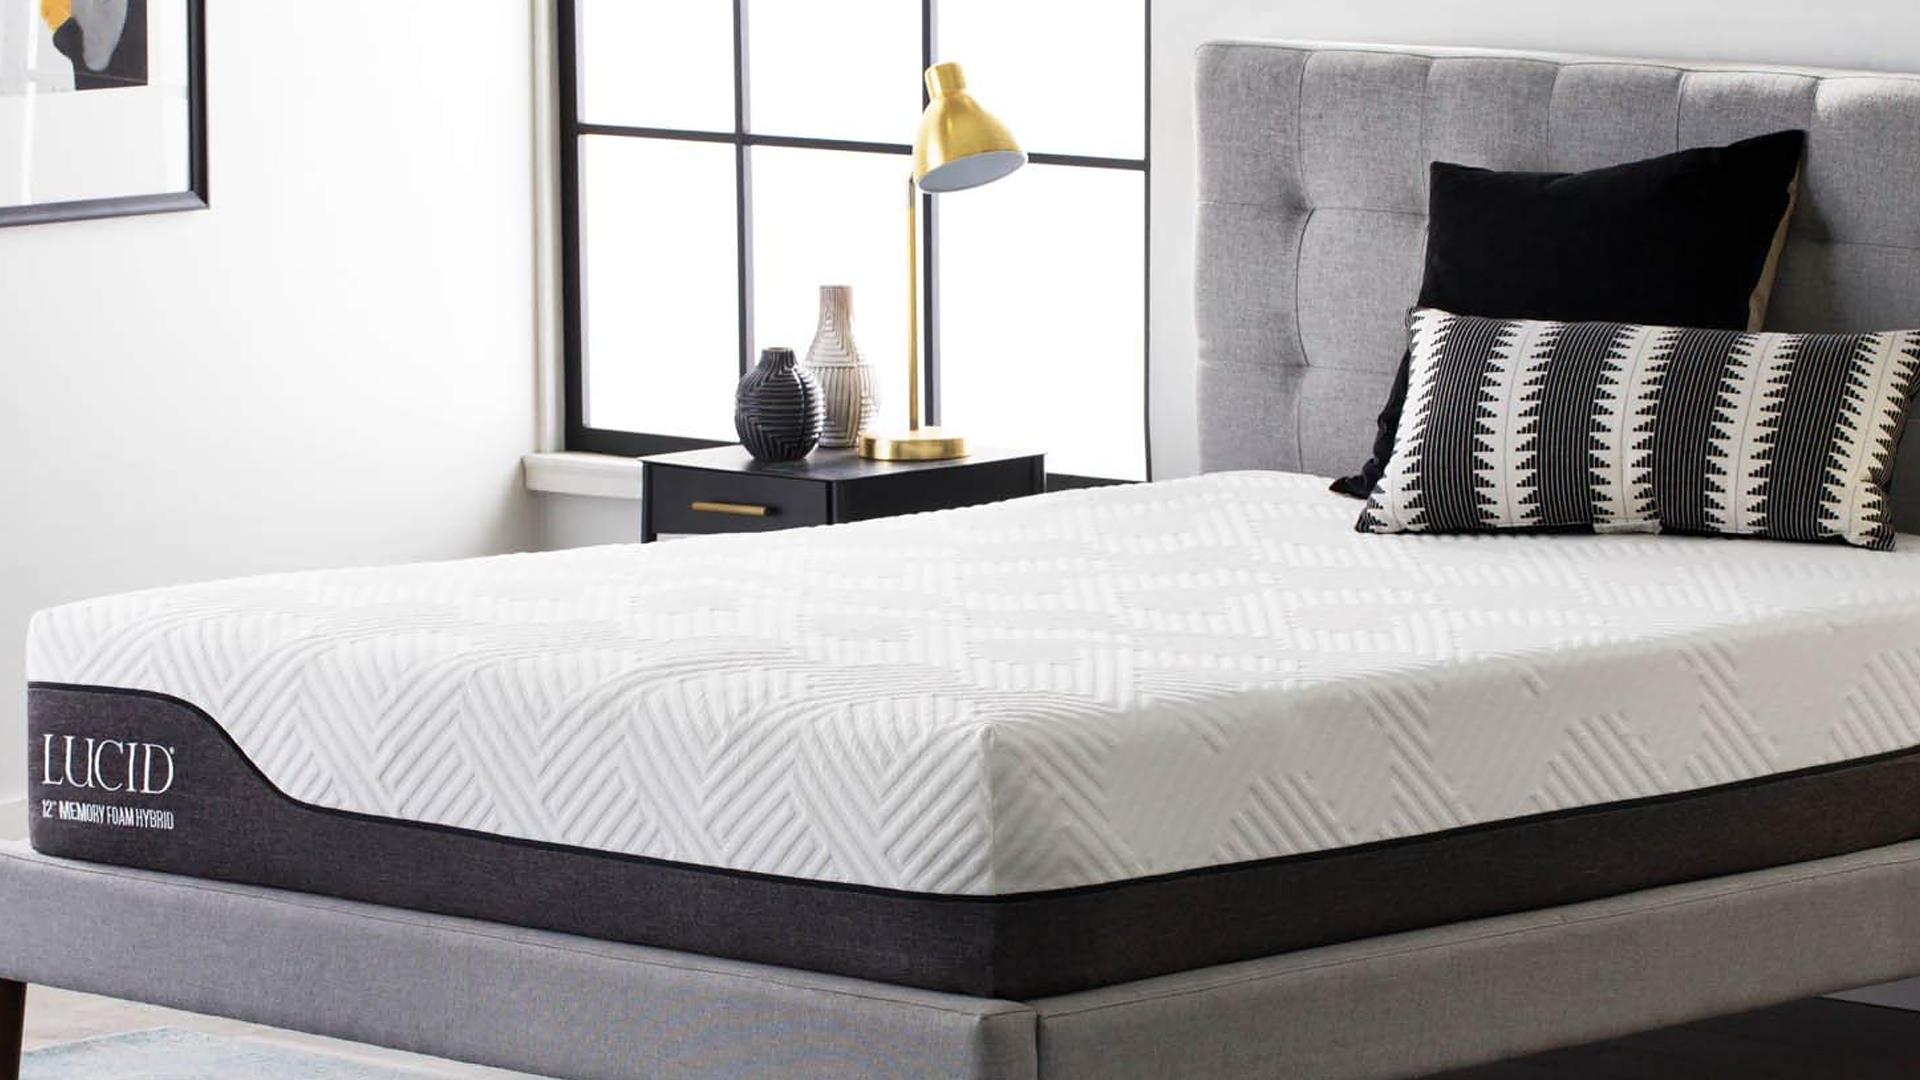 Lucid mattress on a grey foundation and headboard